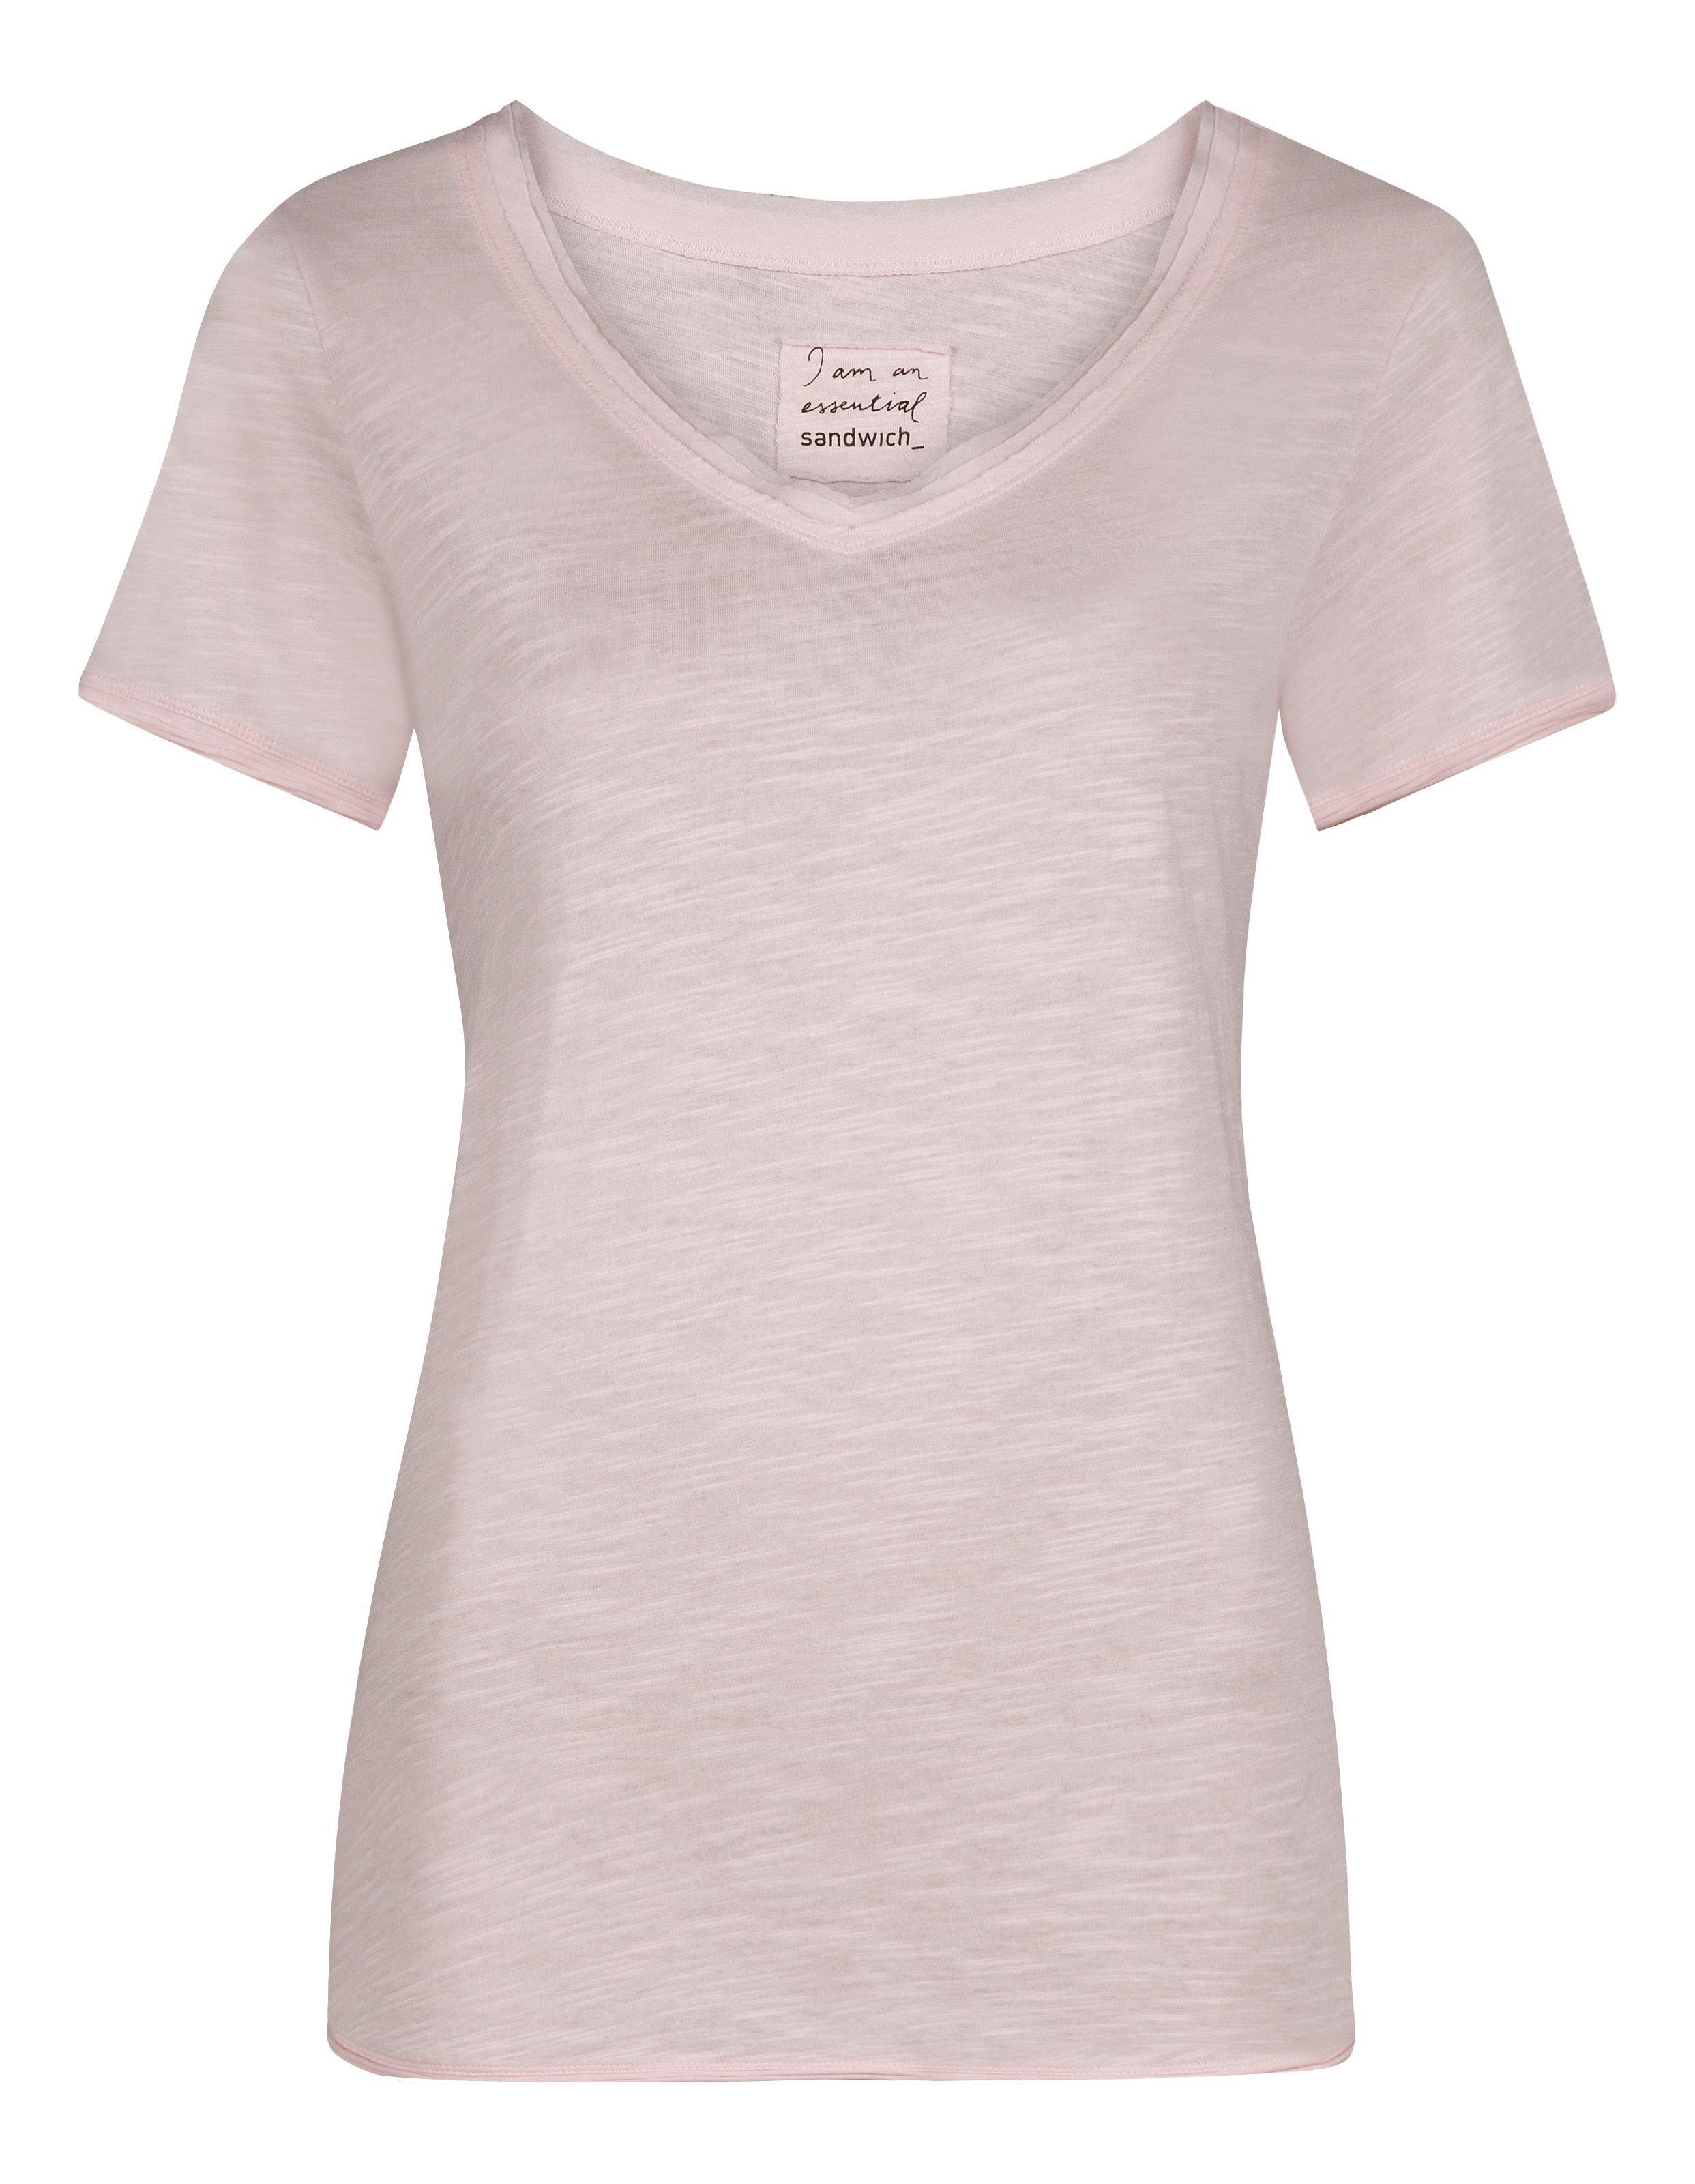 Lyst sandwich short sleeve cotton slub t shirt in pink for What is a slub shirt